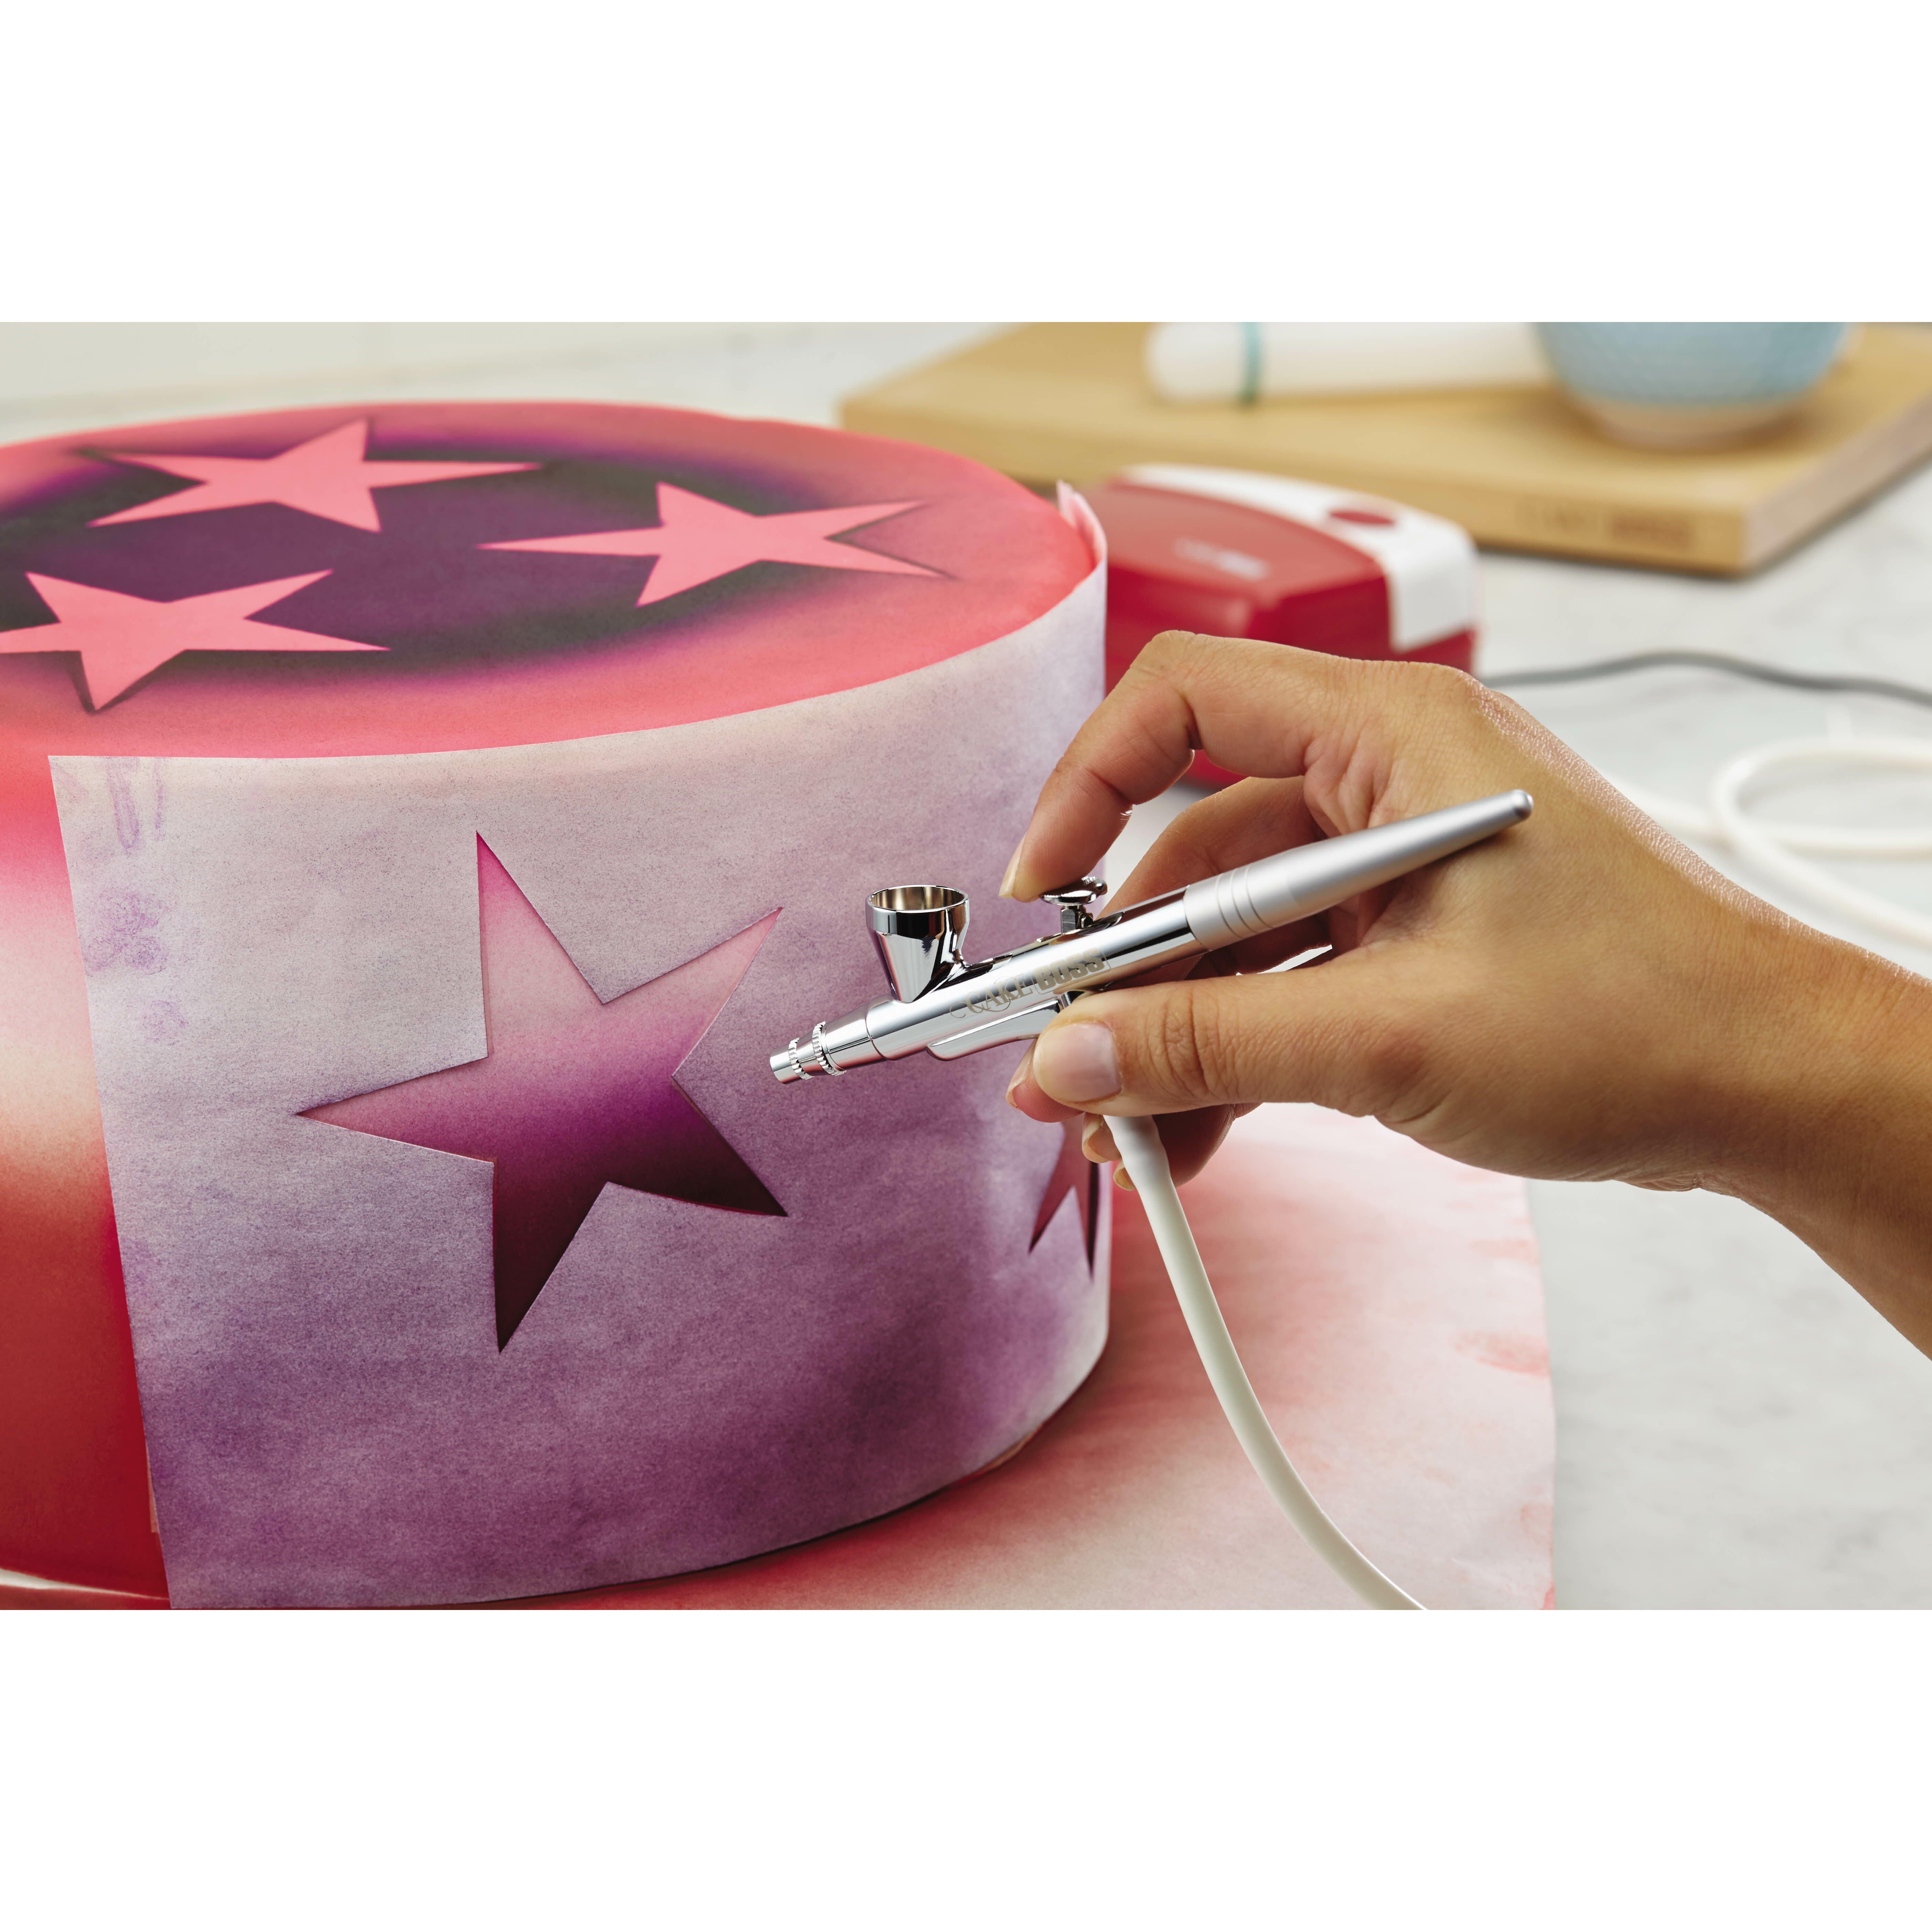 Cake Boss Airbrush Cake Decorating Kit Reviews : Cake Boss Airbrushing Kit & Reviews Wayfair